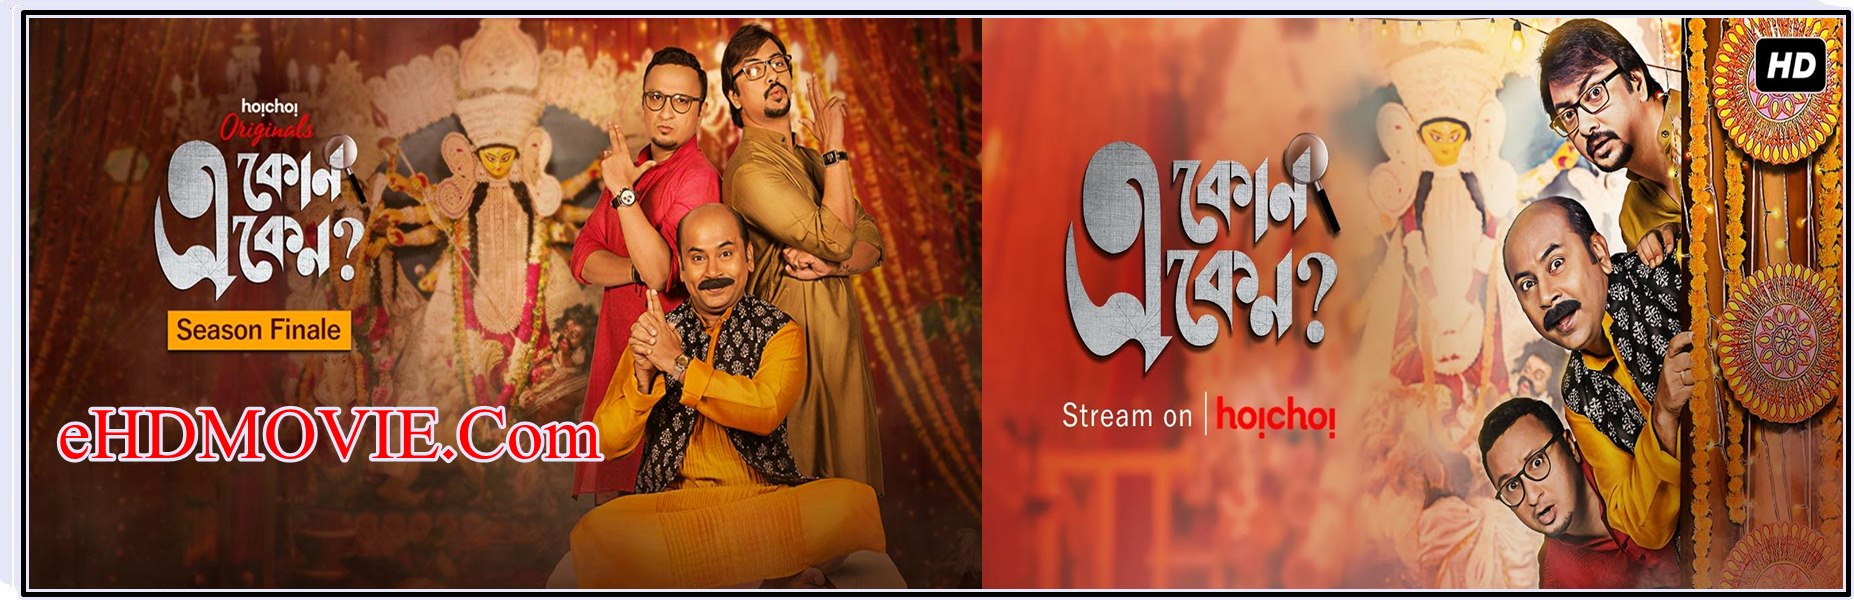 Eken Babu 2018 Season 02 Hoichoi Originals Bengali Web Series Complete Original 480p - 720p ORG WEB-DL 500MB - 1.3GB